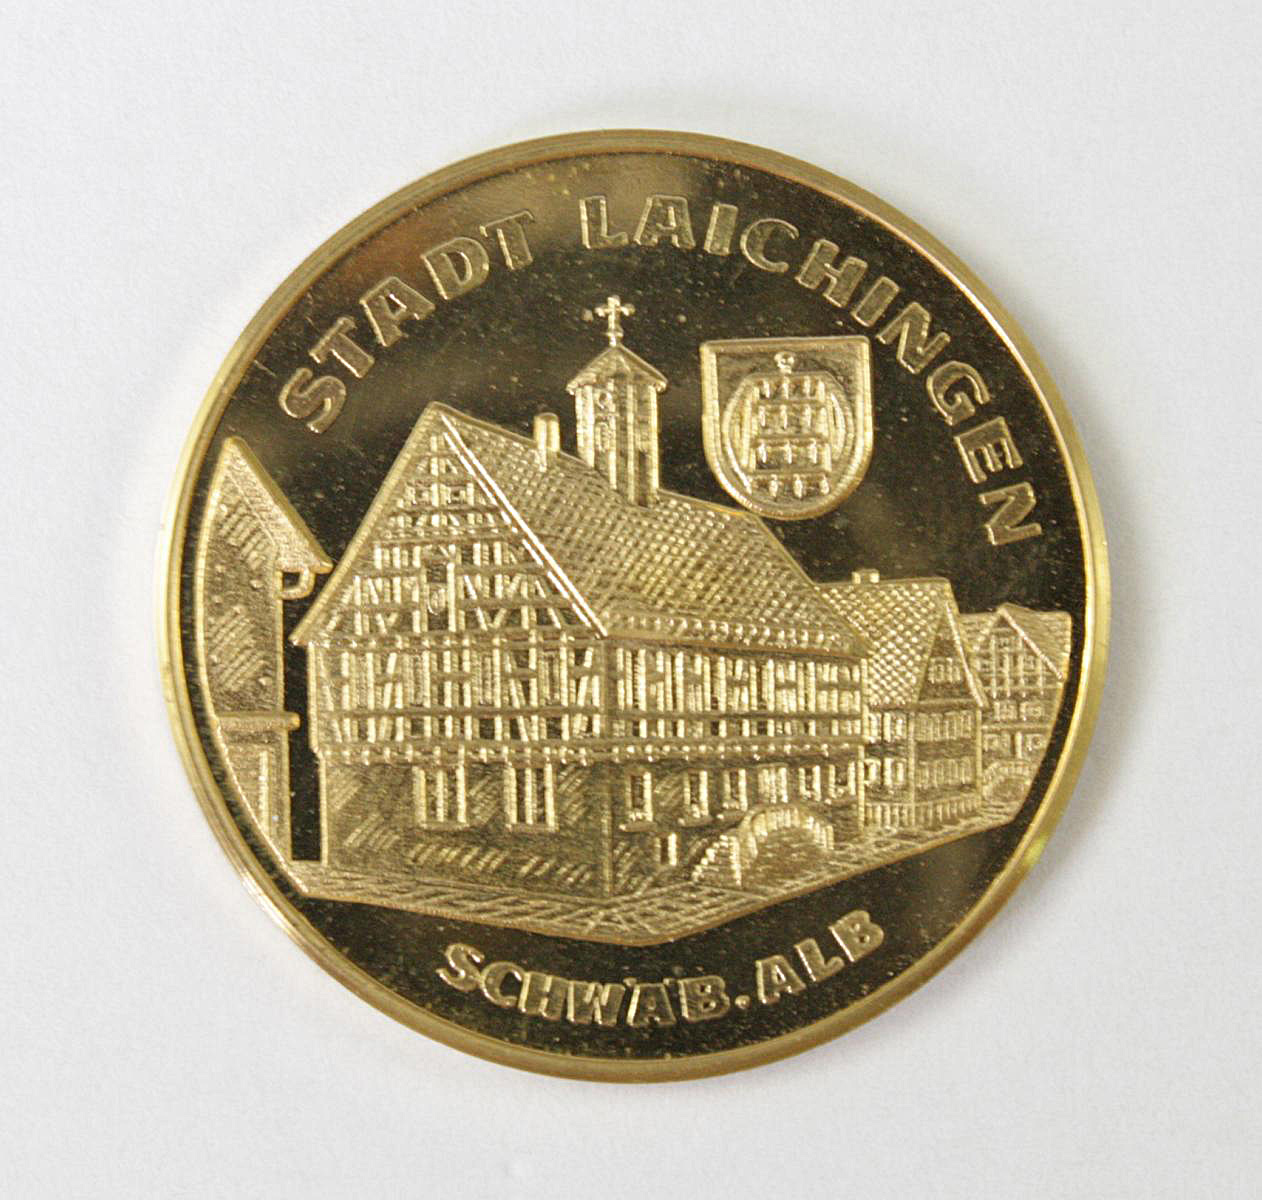 Goldmedaille, Stadt Laichingen